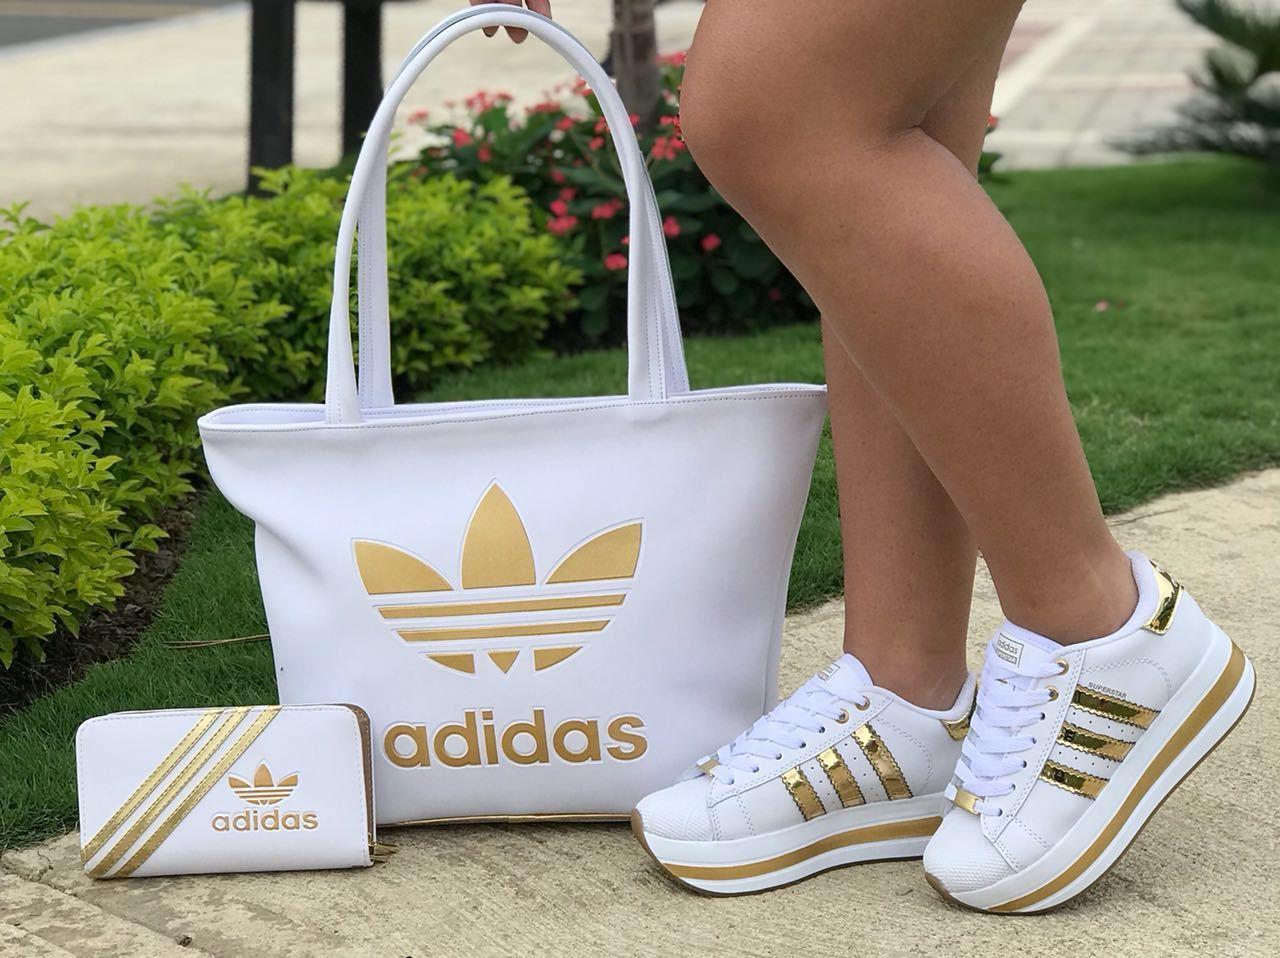 adidas trainers and nike bag